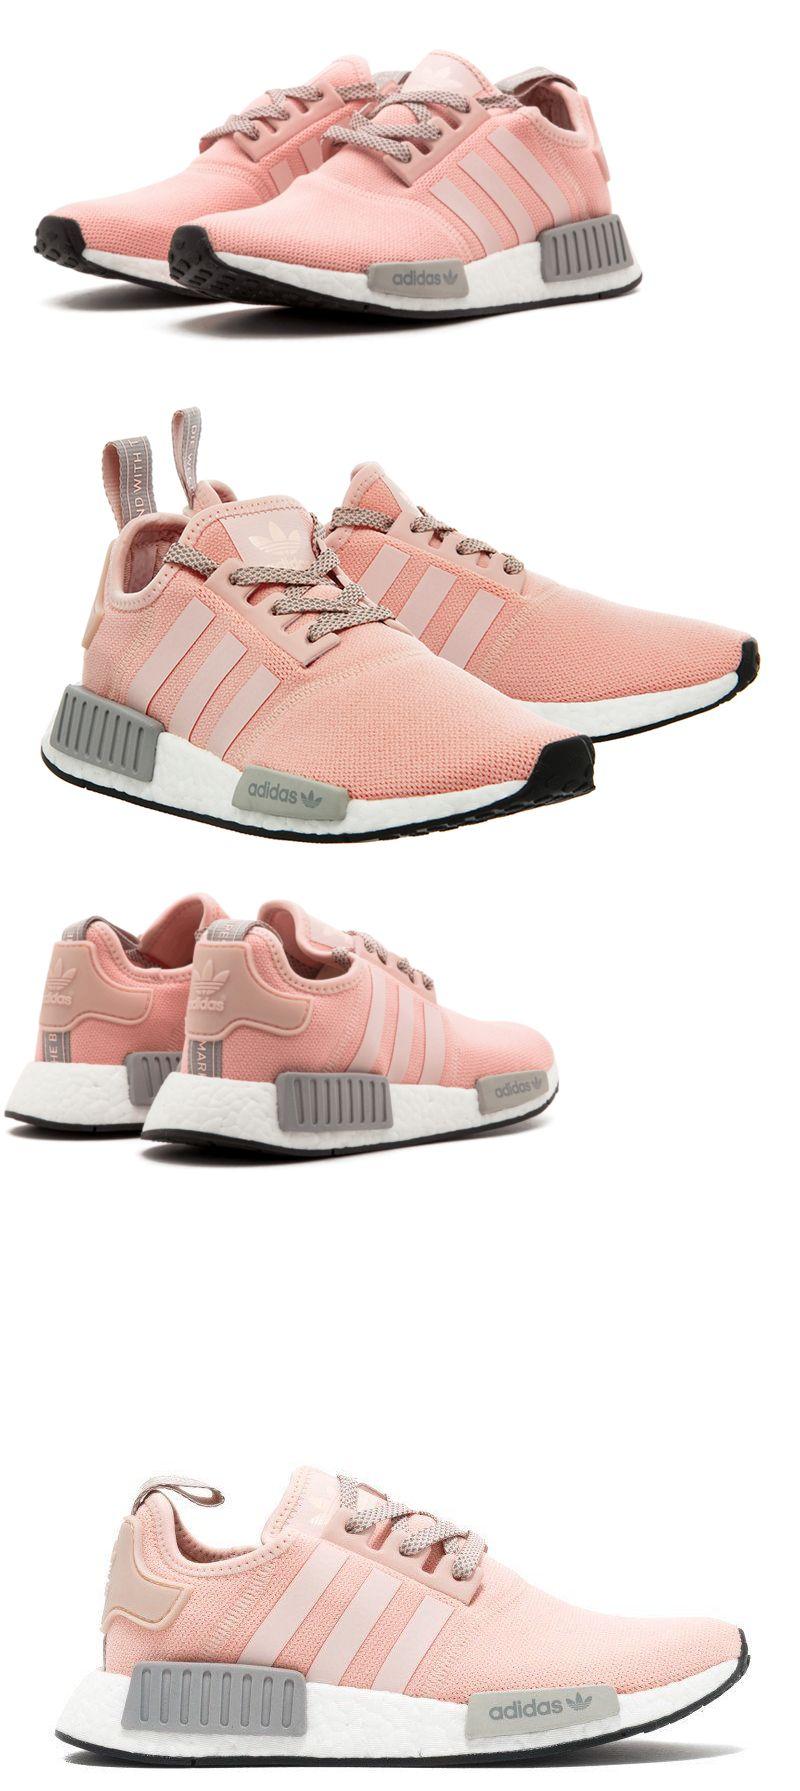 atletico 95672: adidas nmd r1 by3059 donna rosa grigio vapore onyx